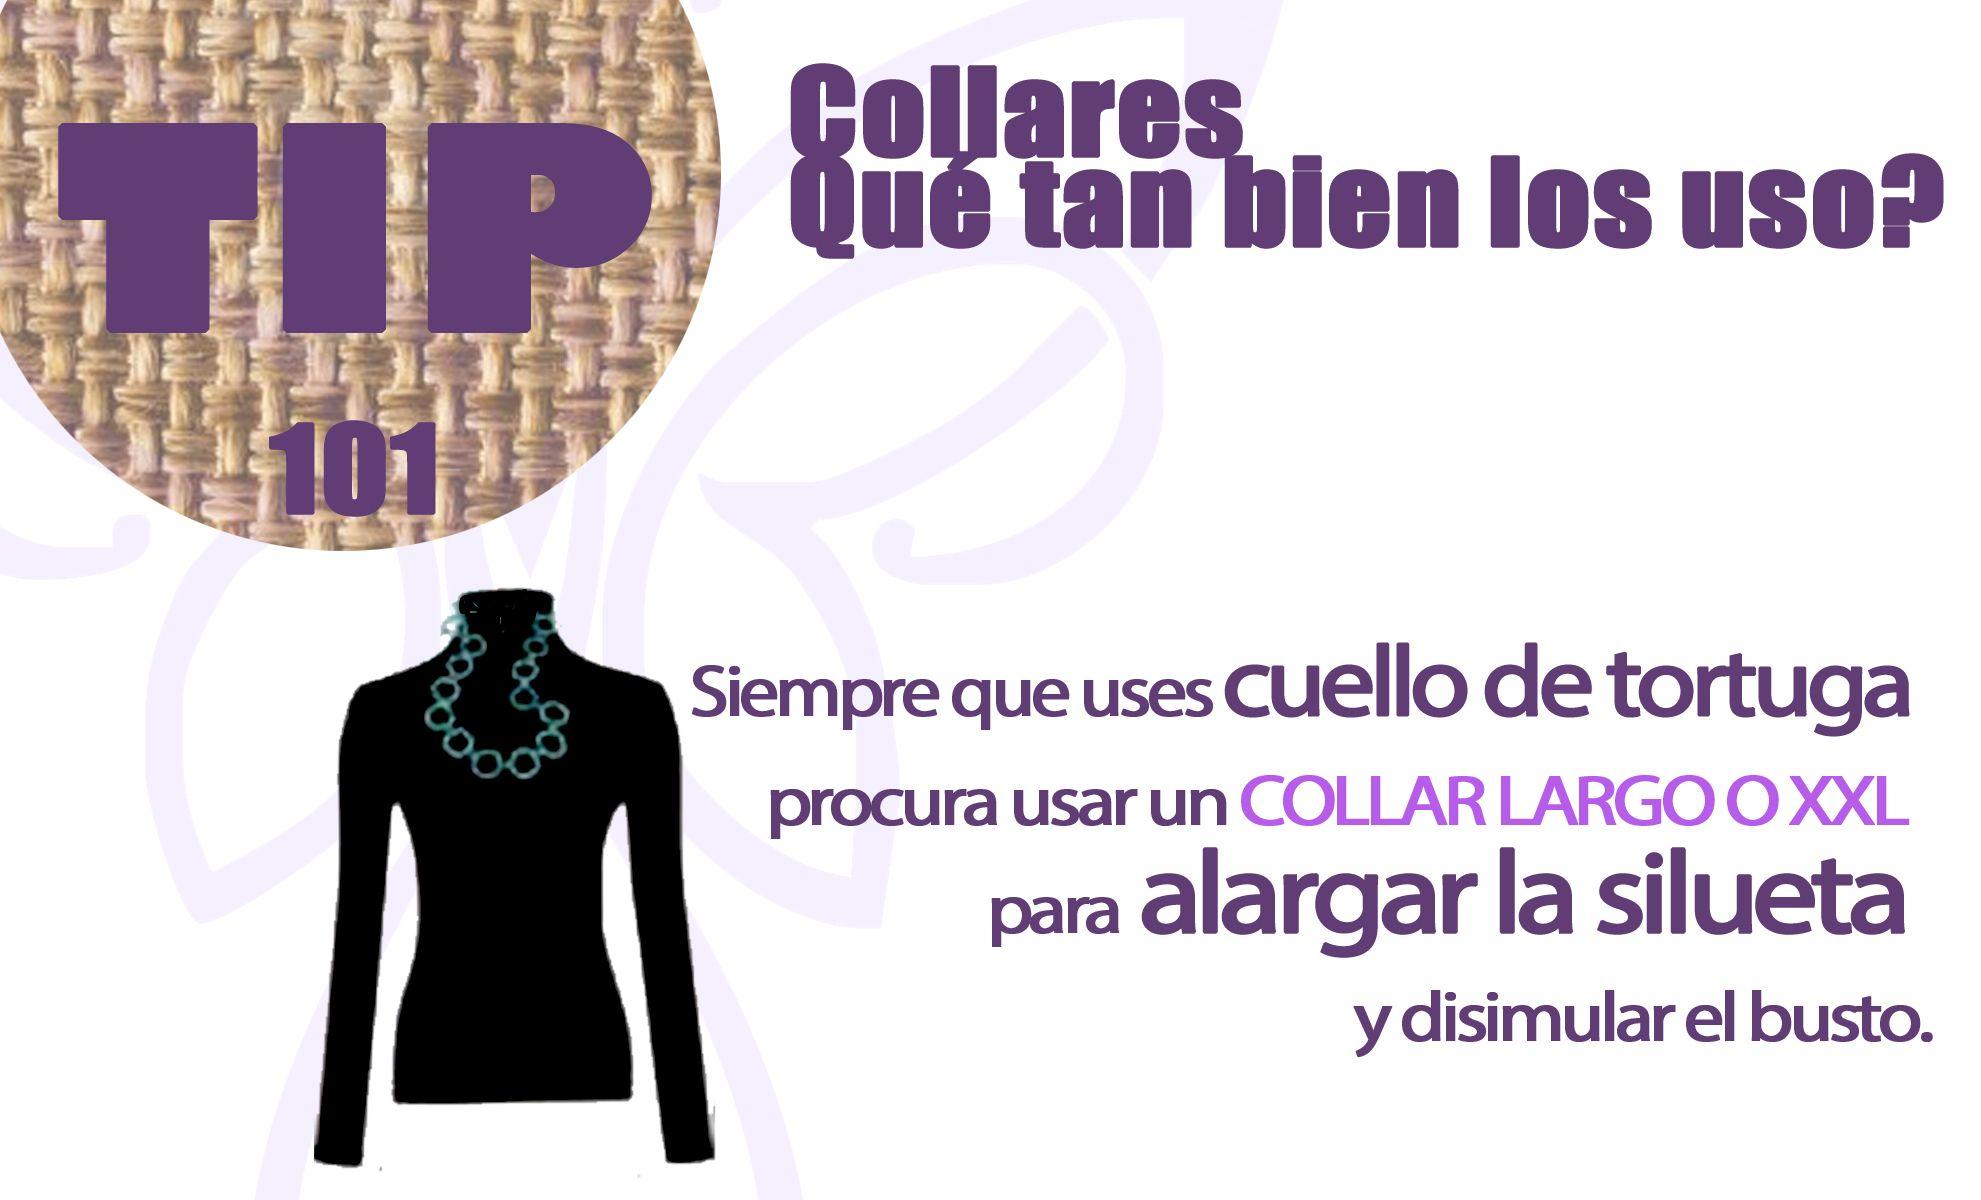 "Mejora tus looks con #tips101 de #Tamaraccesorios. Dale ""follow"" a nuestro twitter http://ow.ly/sHXvr"